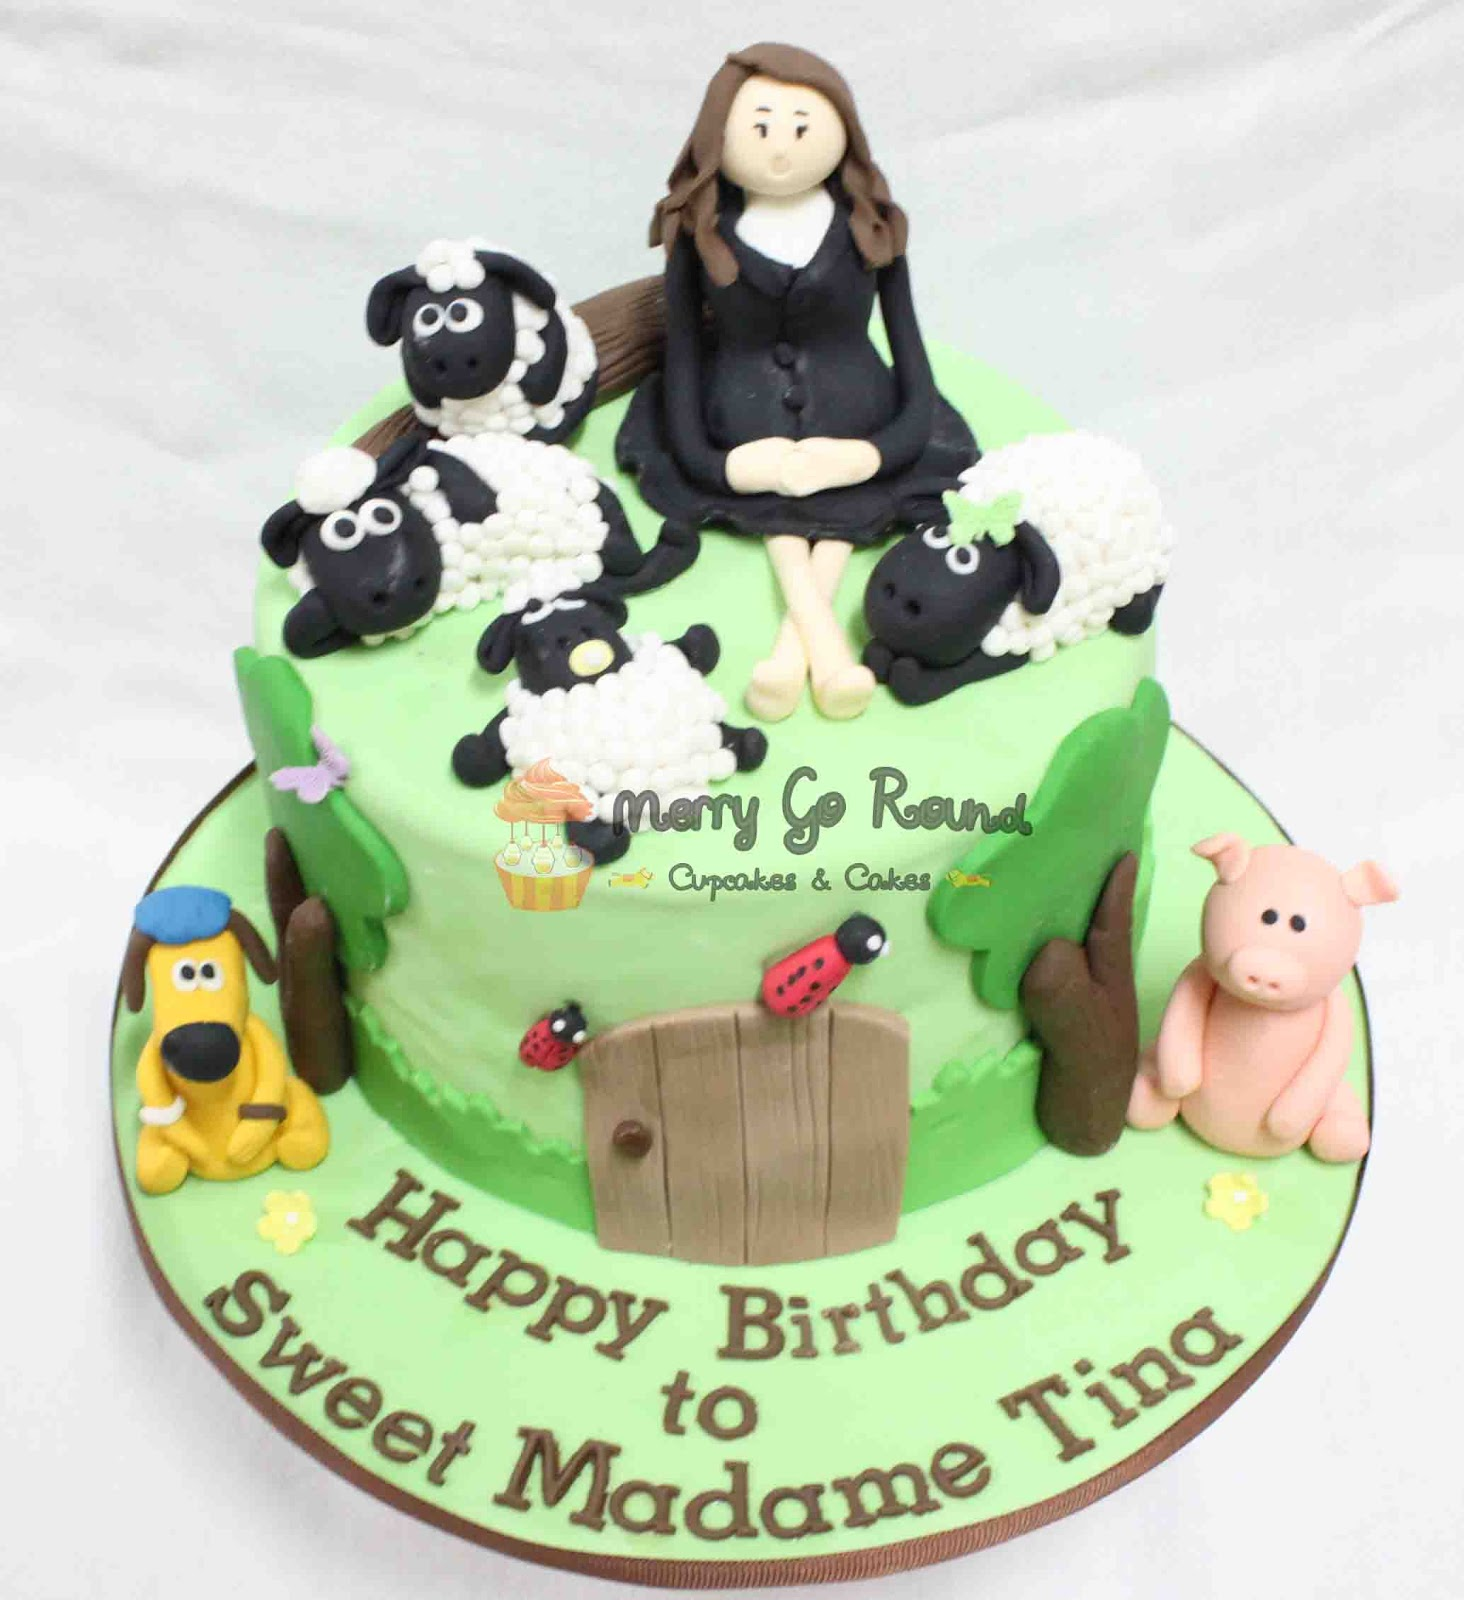 Merry Go Round Cupcakes Cakes Shaun The Sheep Birthday Cake